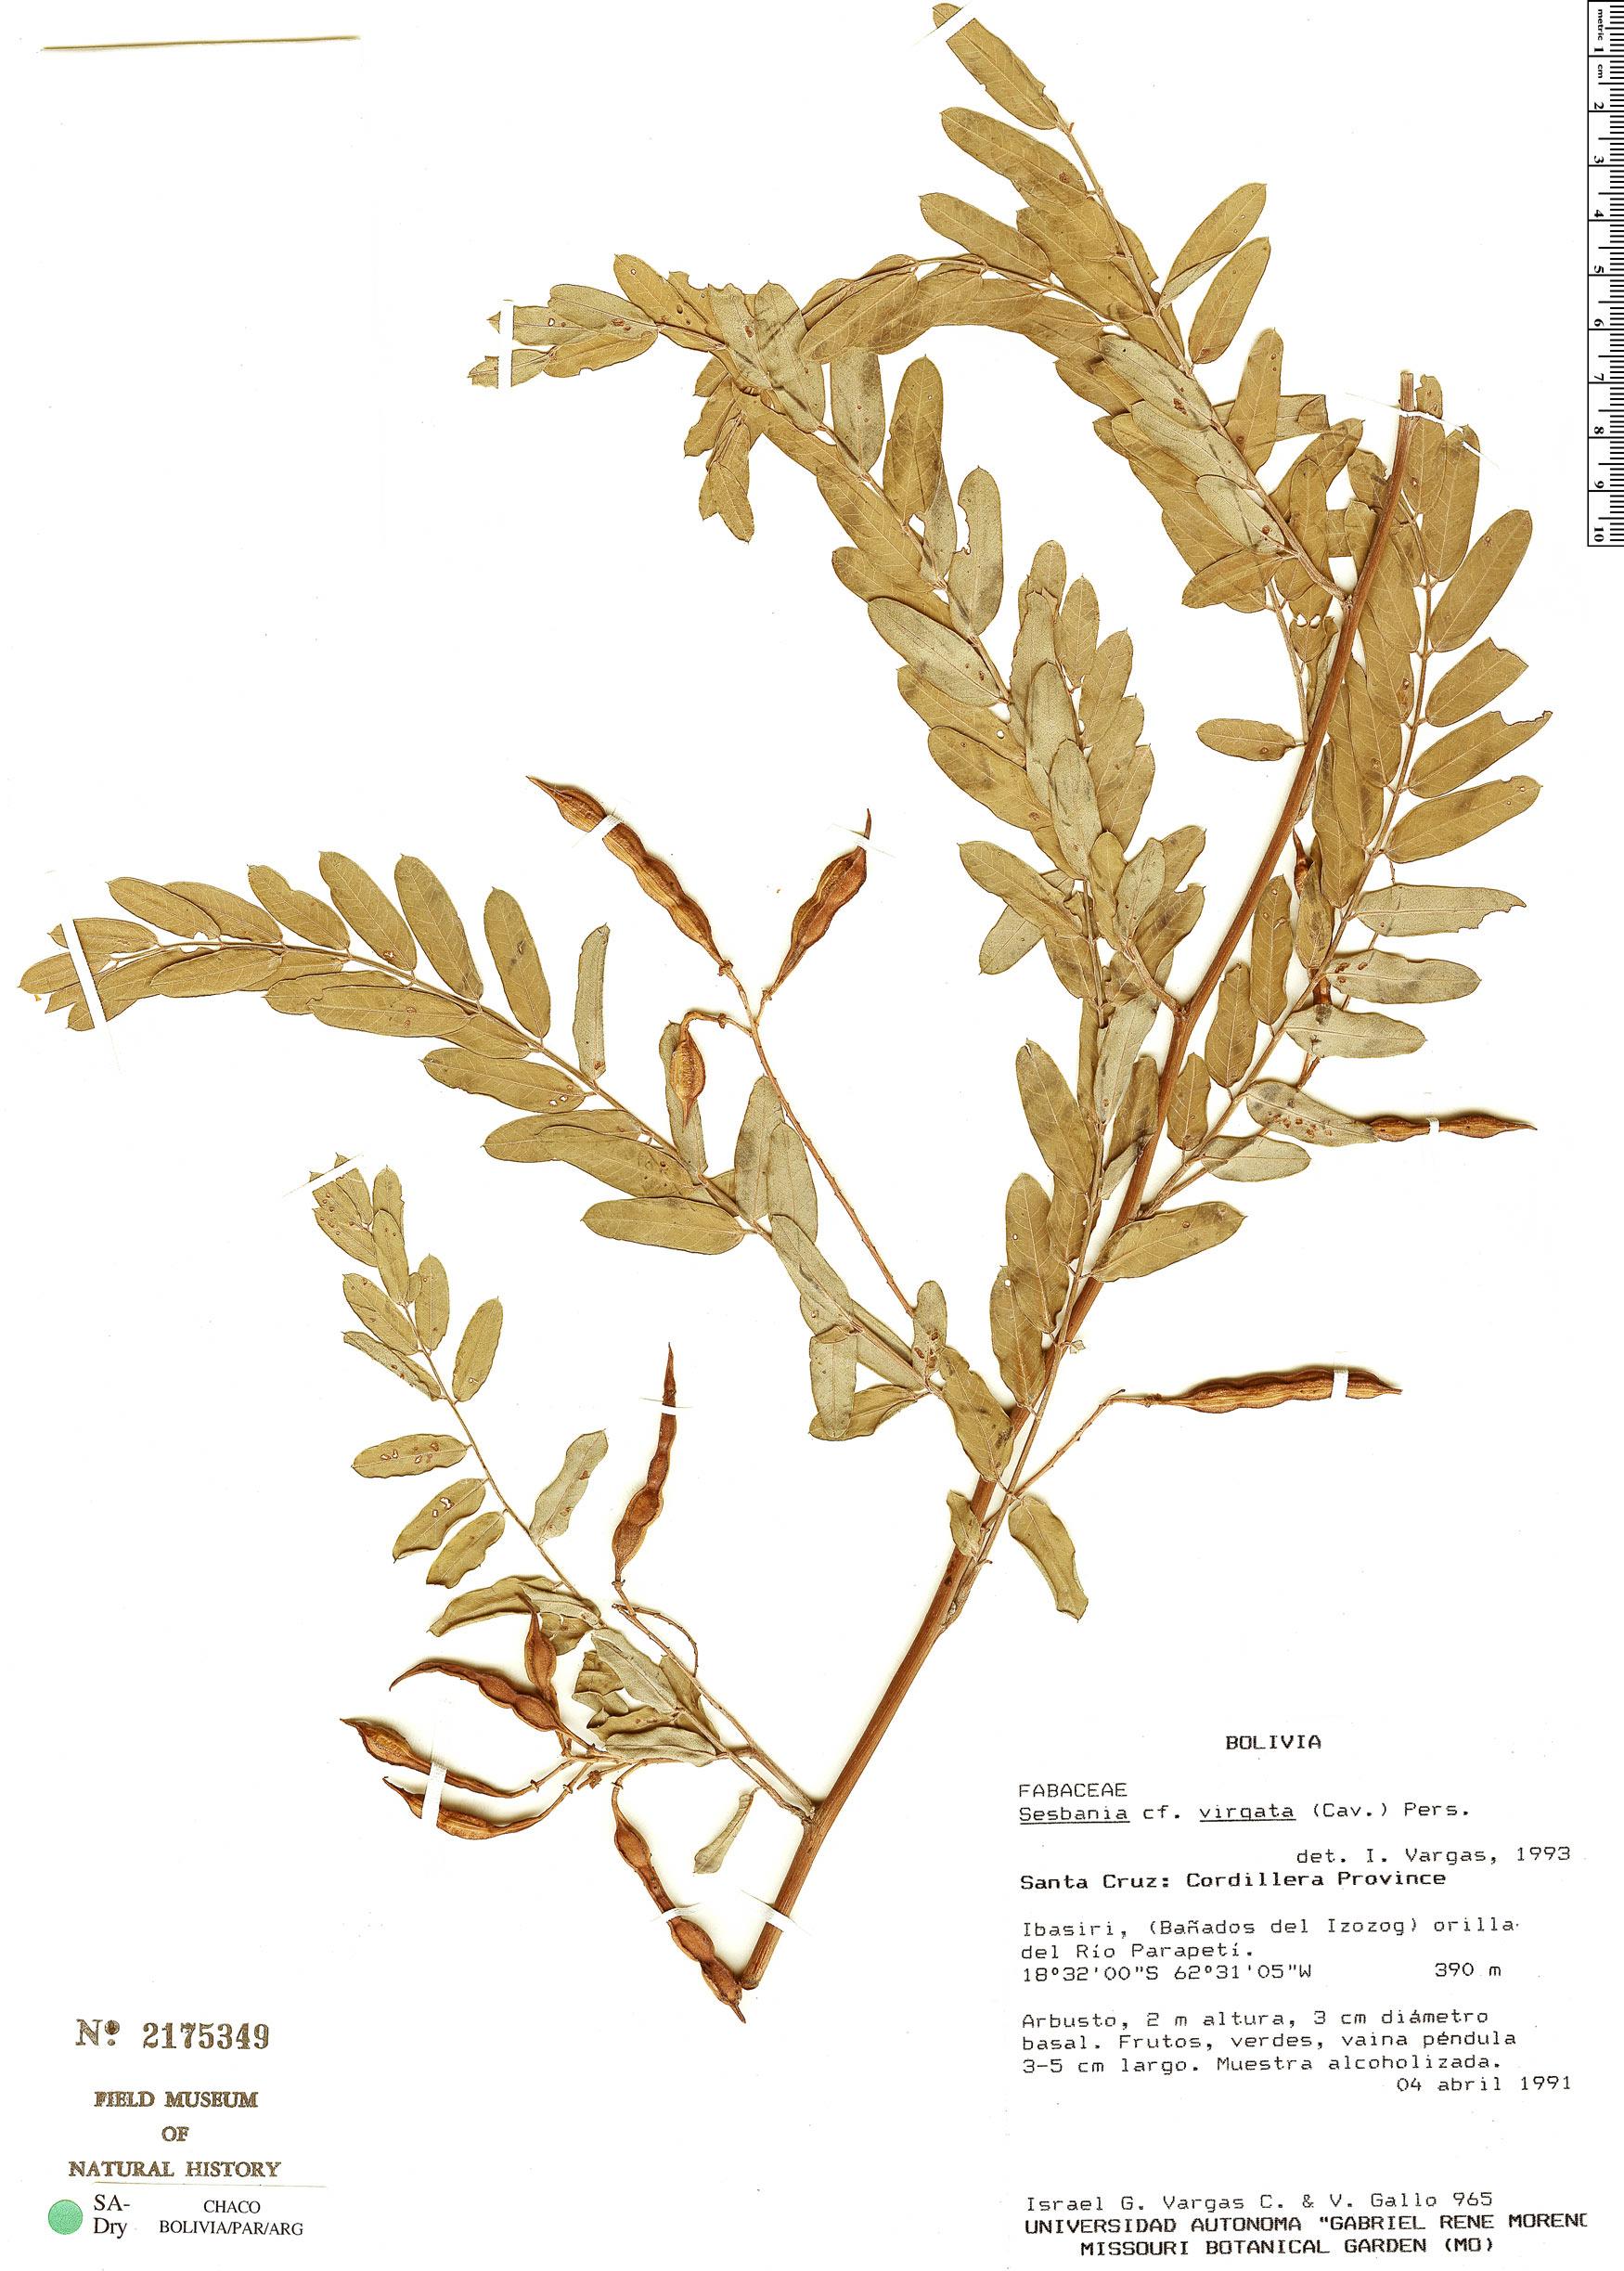 Specimen: Sesbania virgata